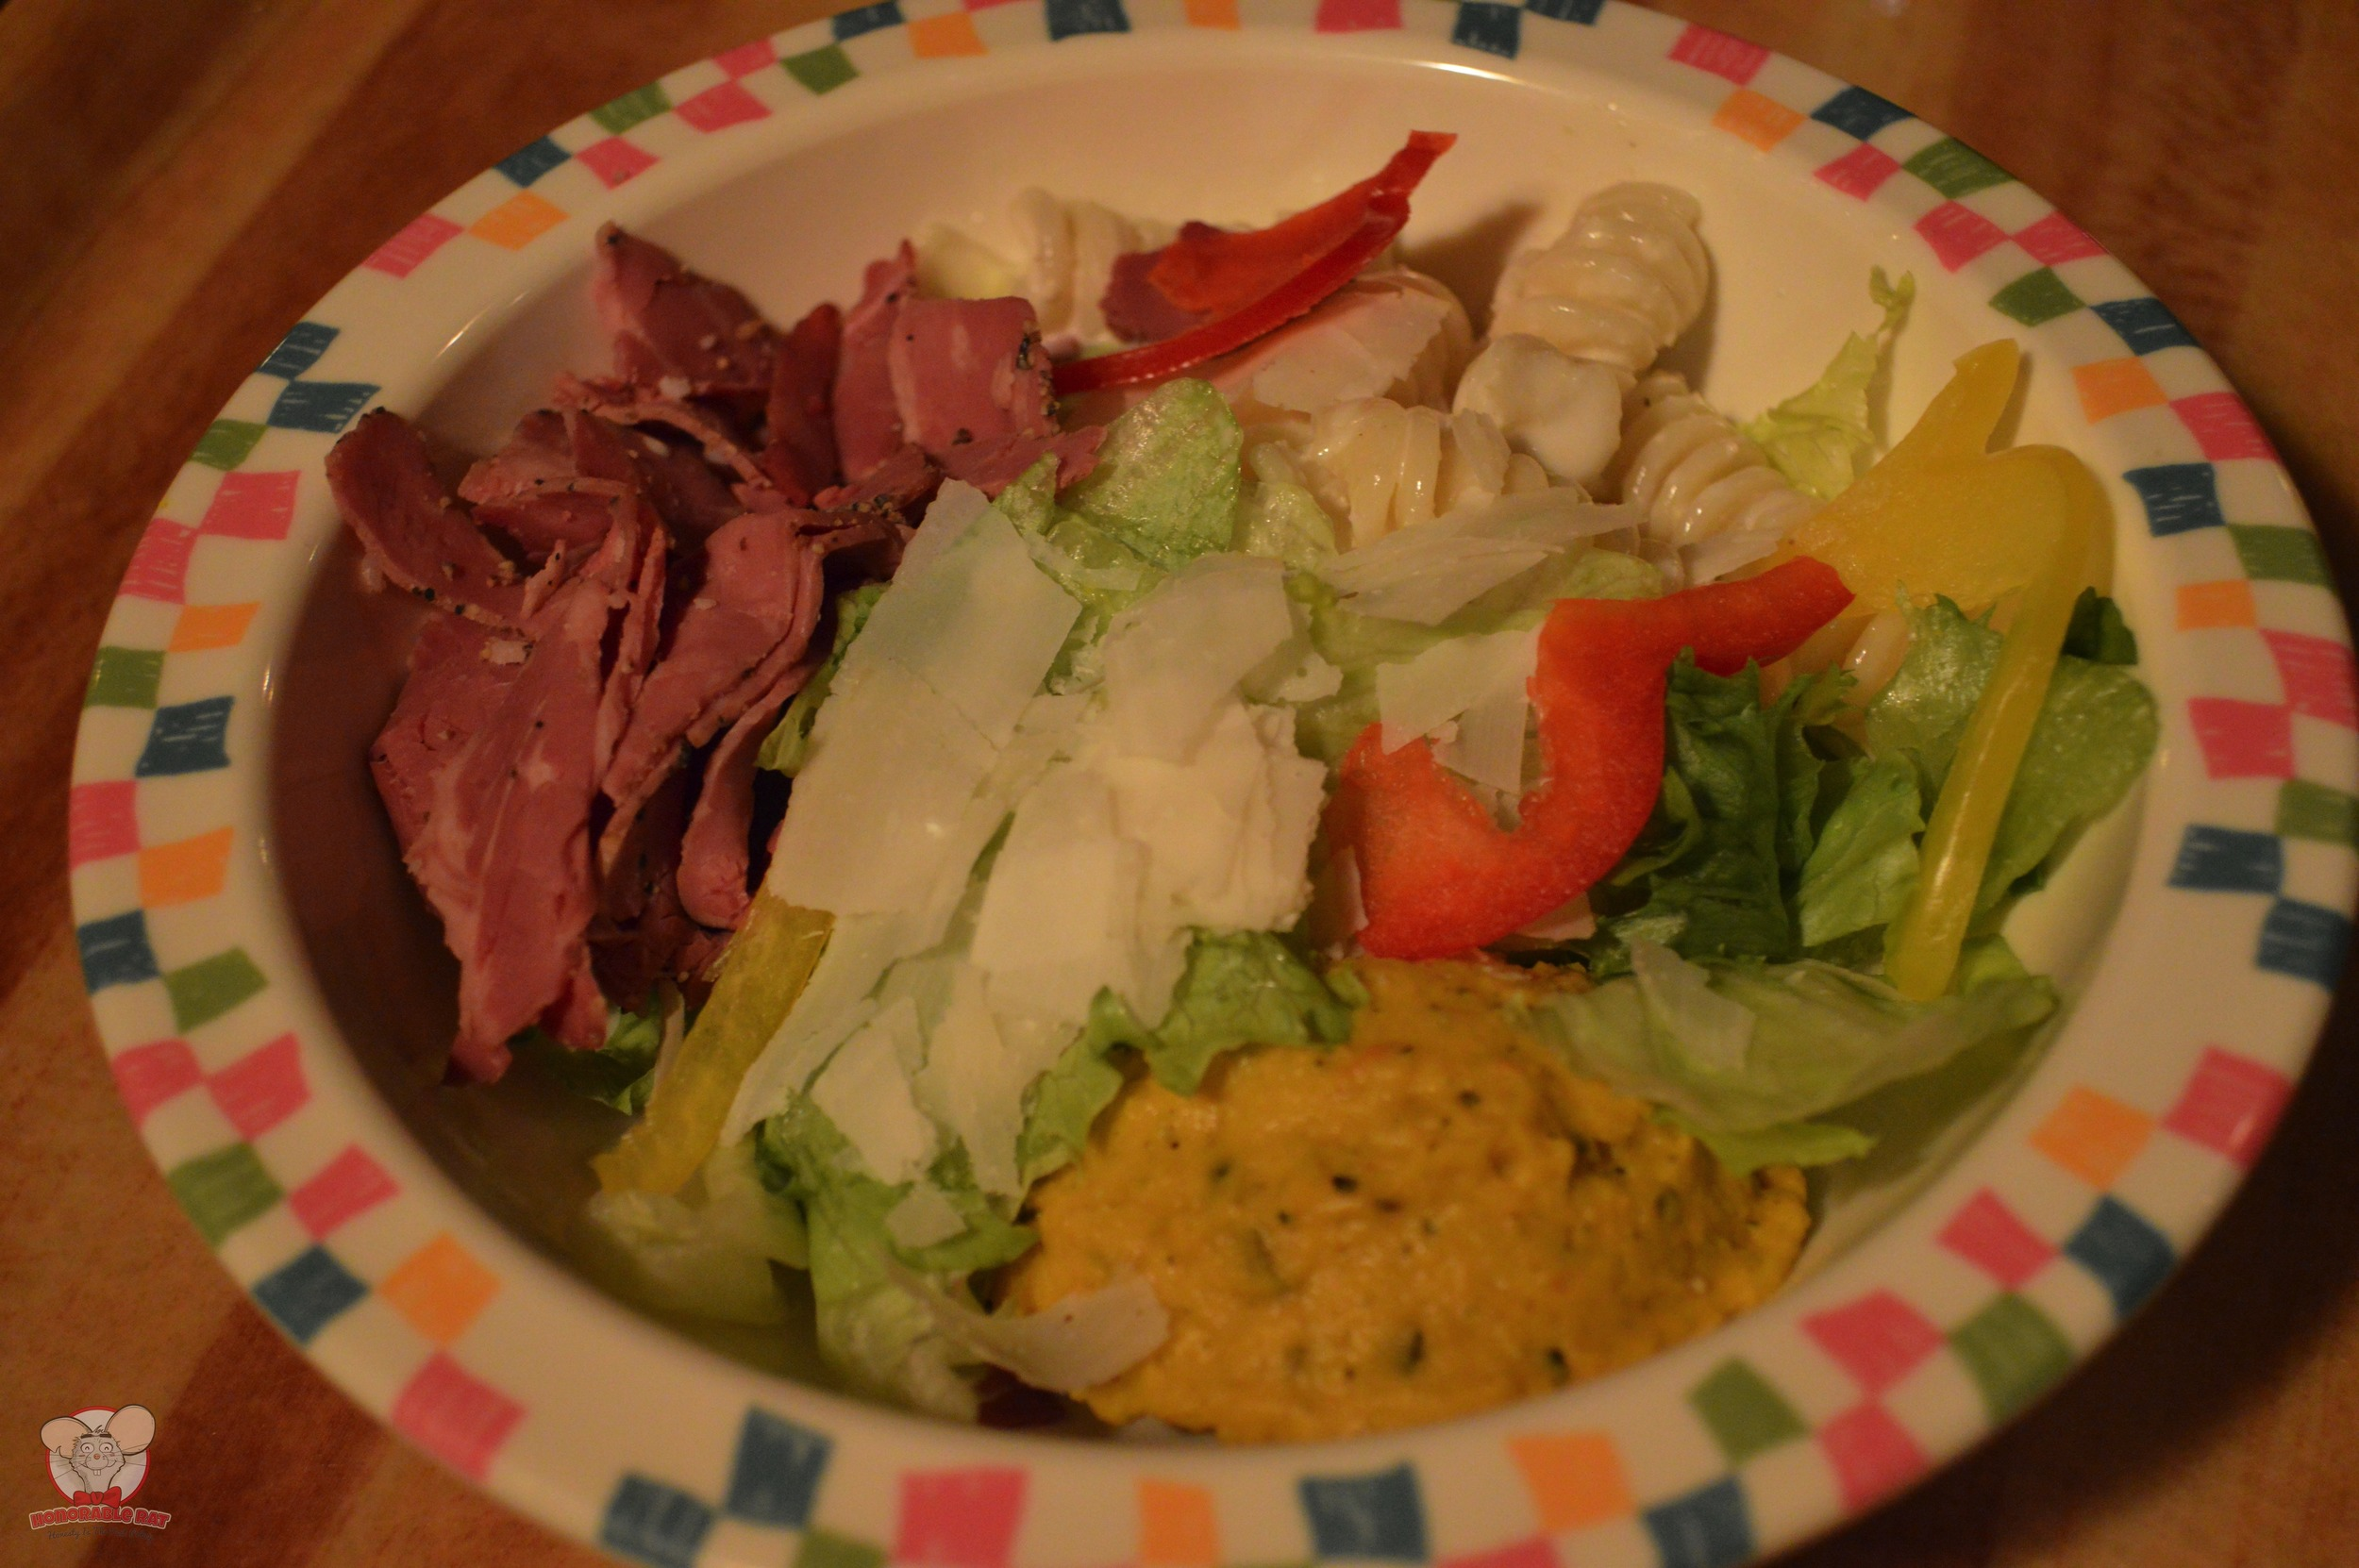 Beef Pastrami and Pumpkin Salad